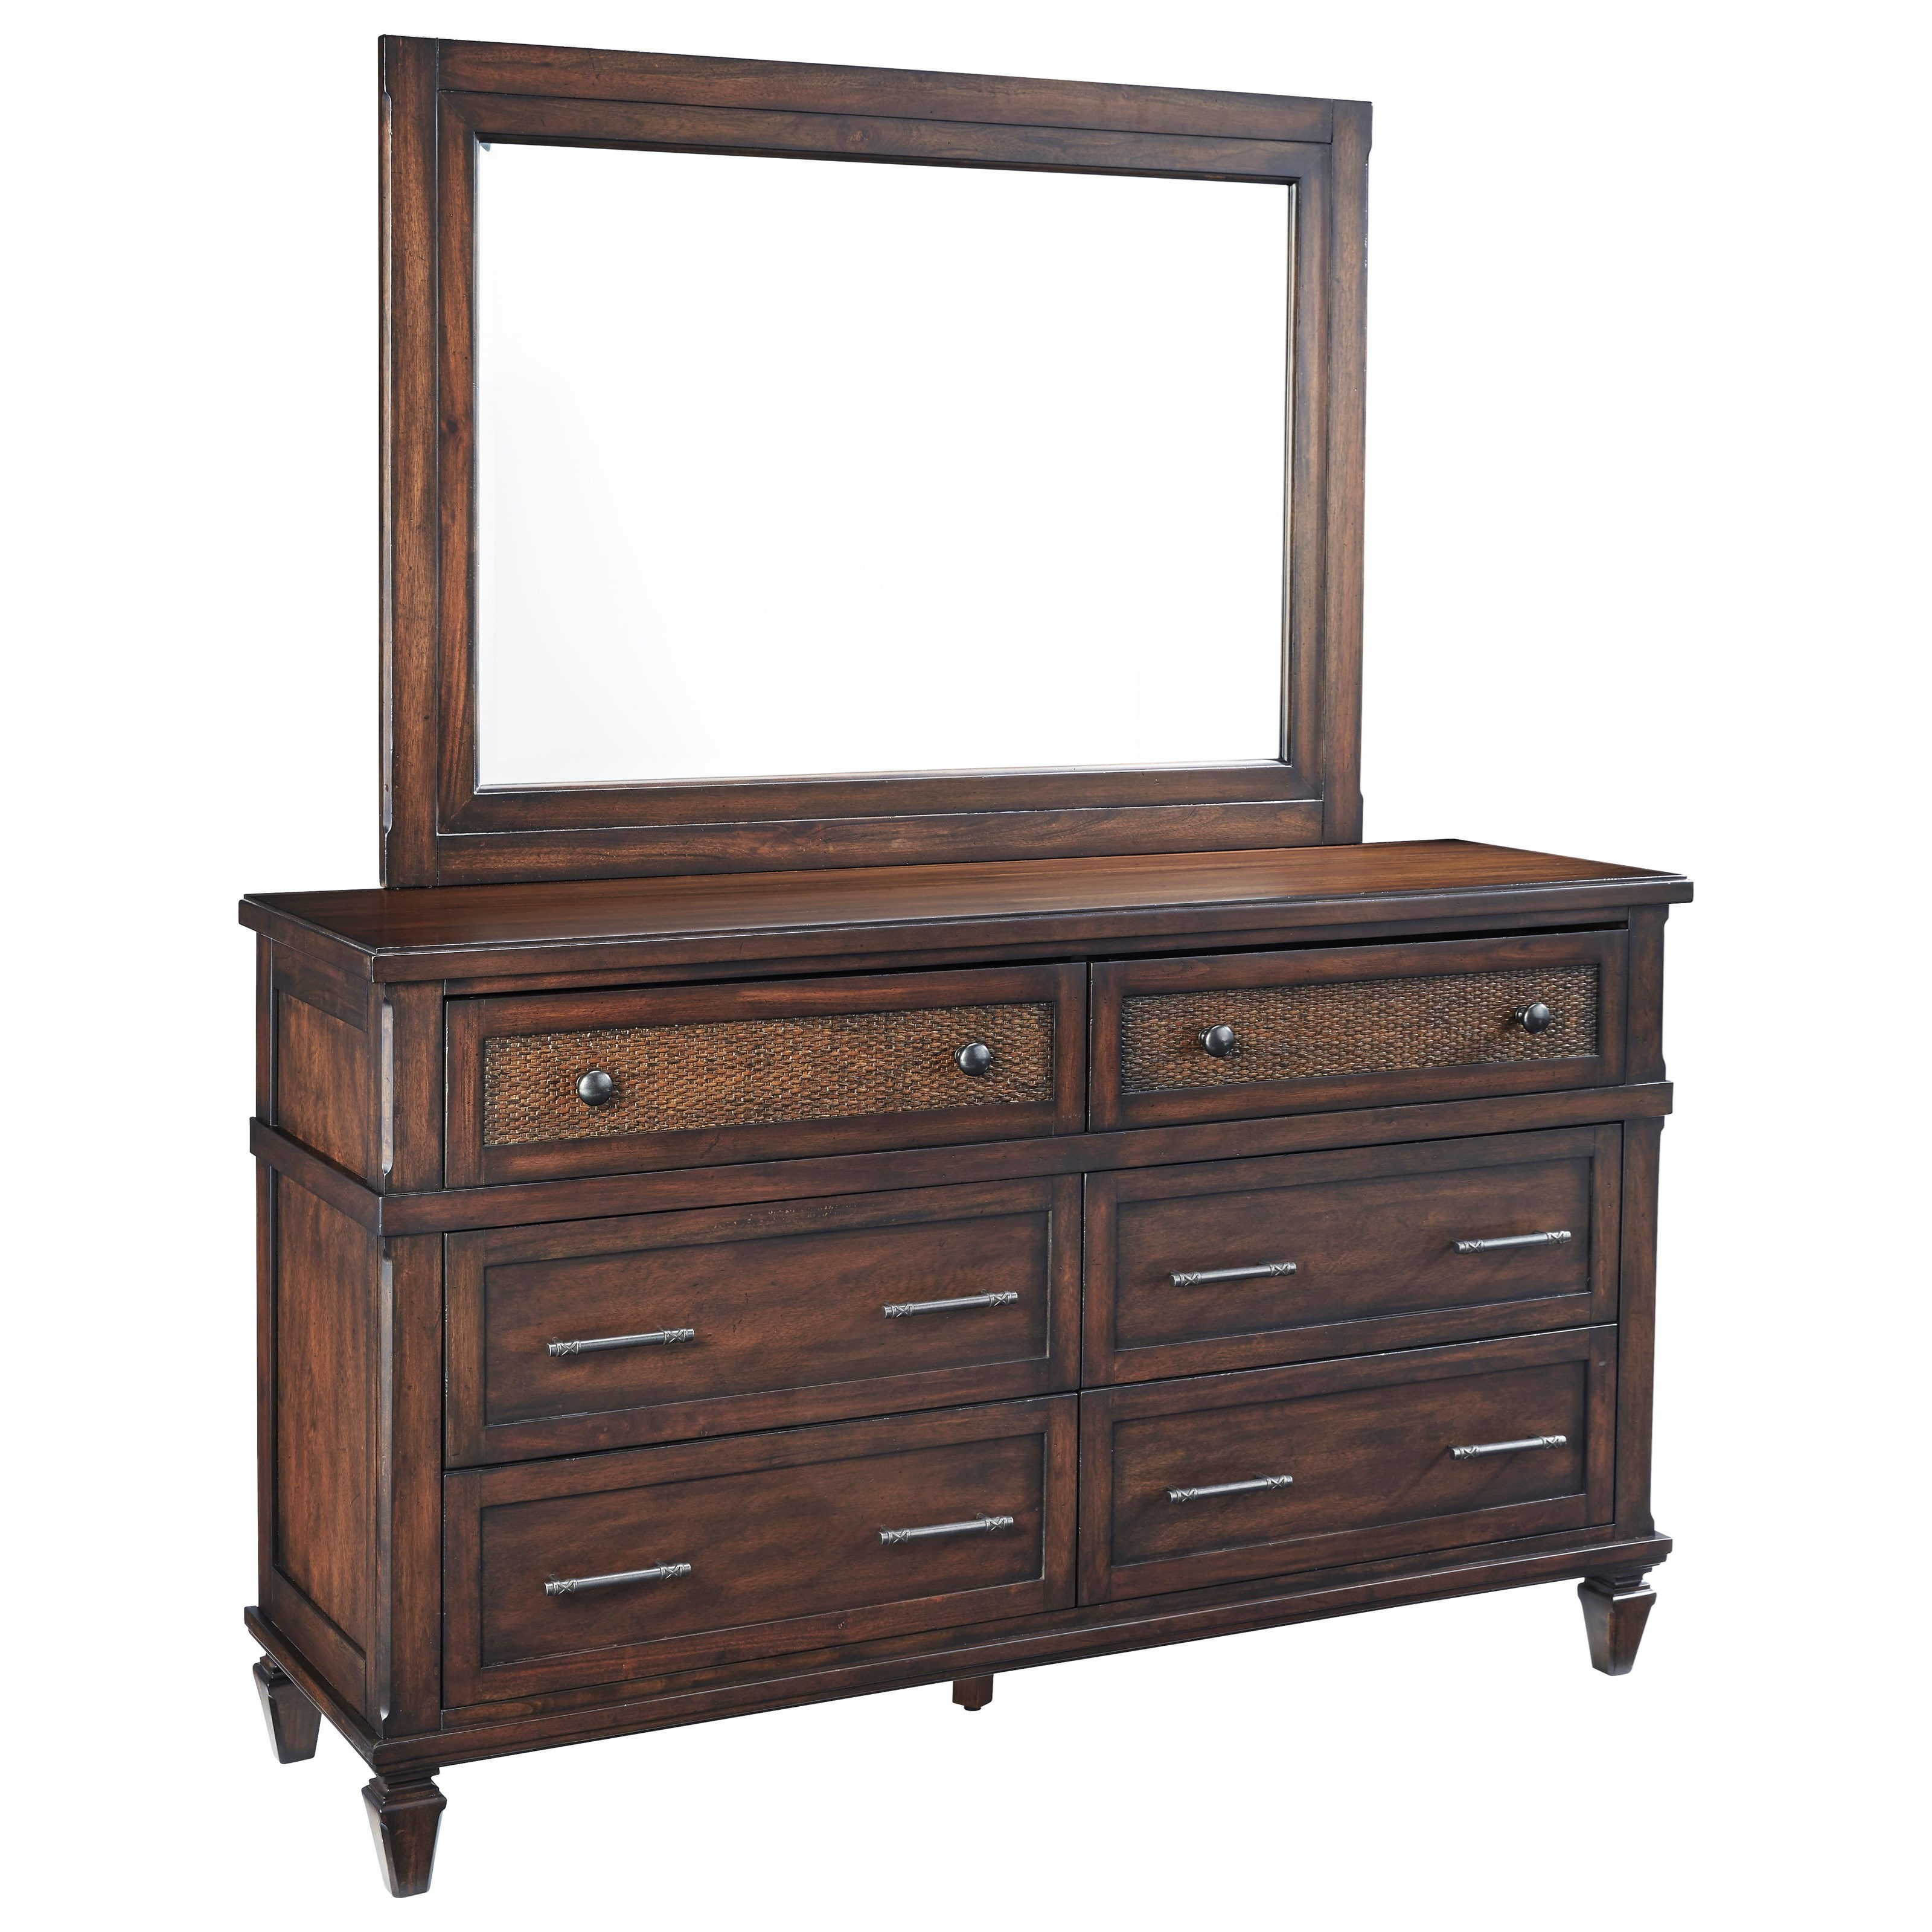 Coronado Drawer Dresser and Mirror Set by Progressive Furniture at Dean Bosler's